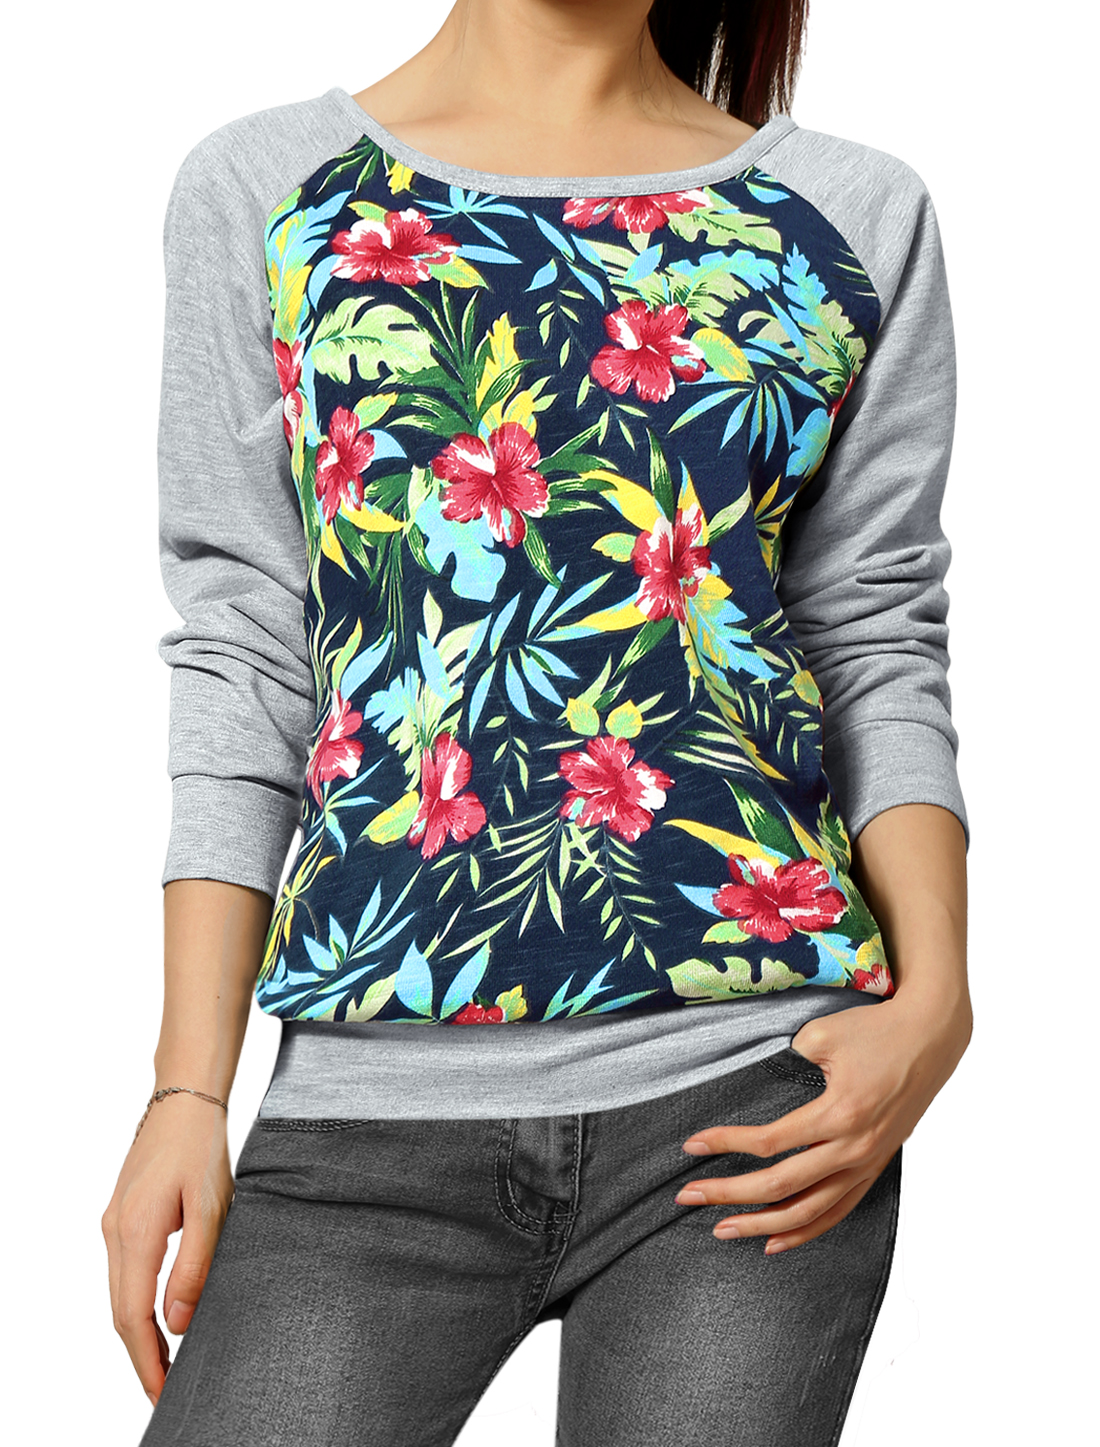 Allegra K Woman Floral Raglan Sleeves Color Block Sweatshirt Gray Navy Blue XS